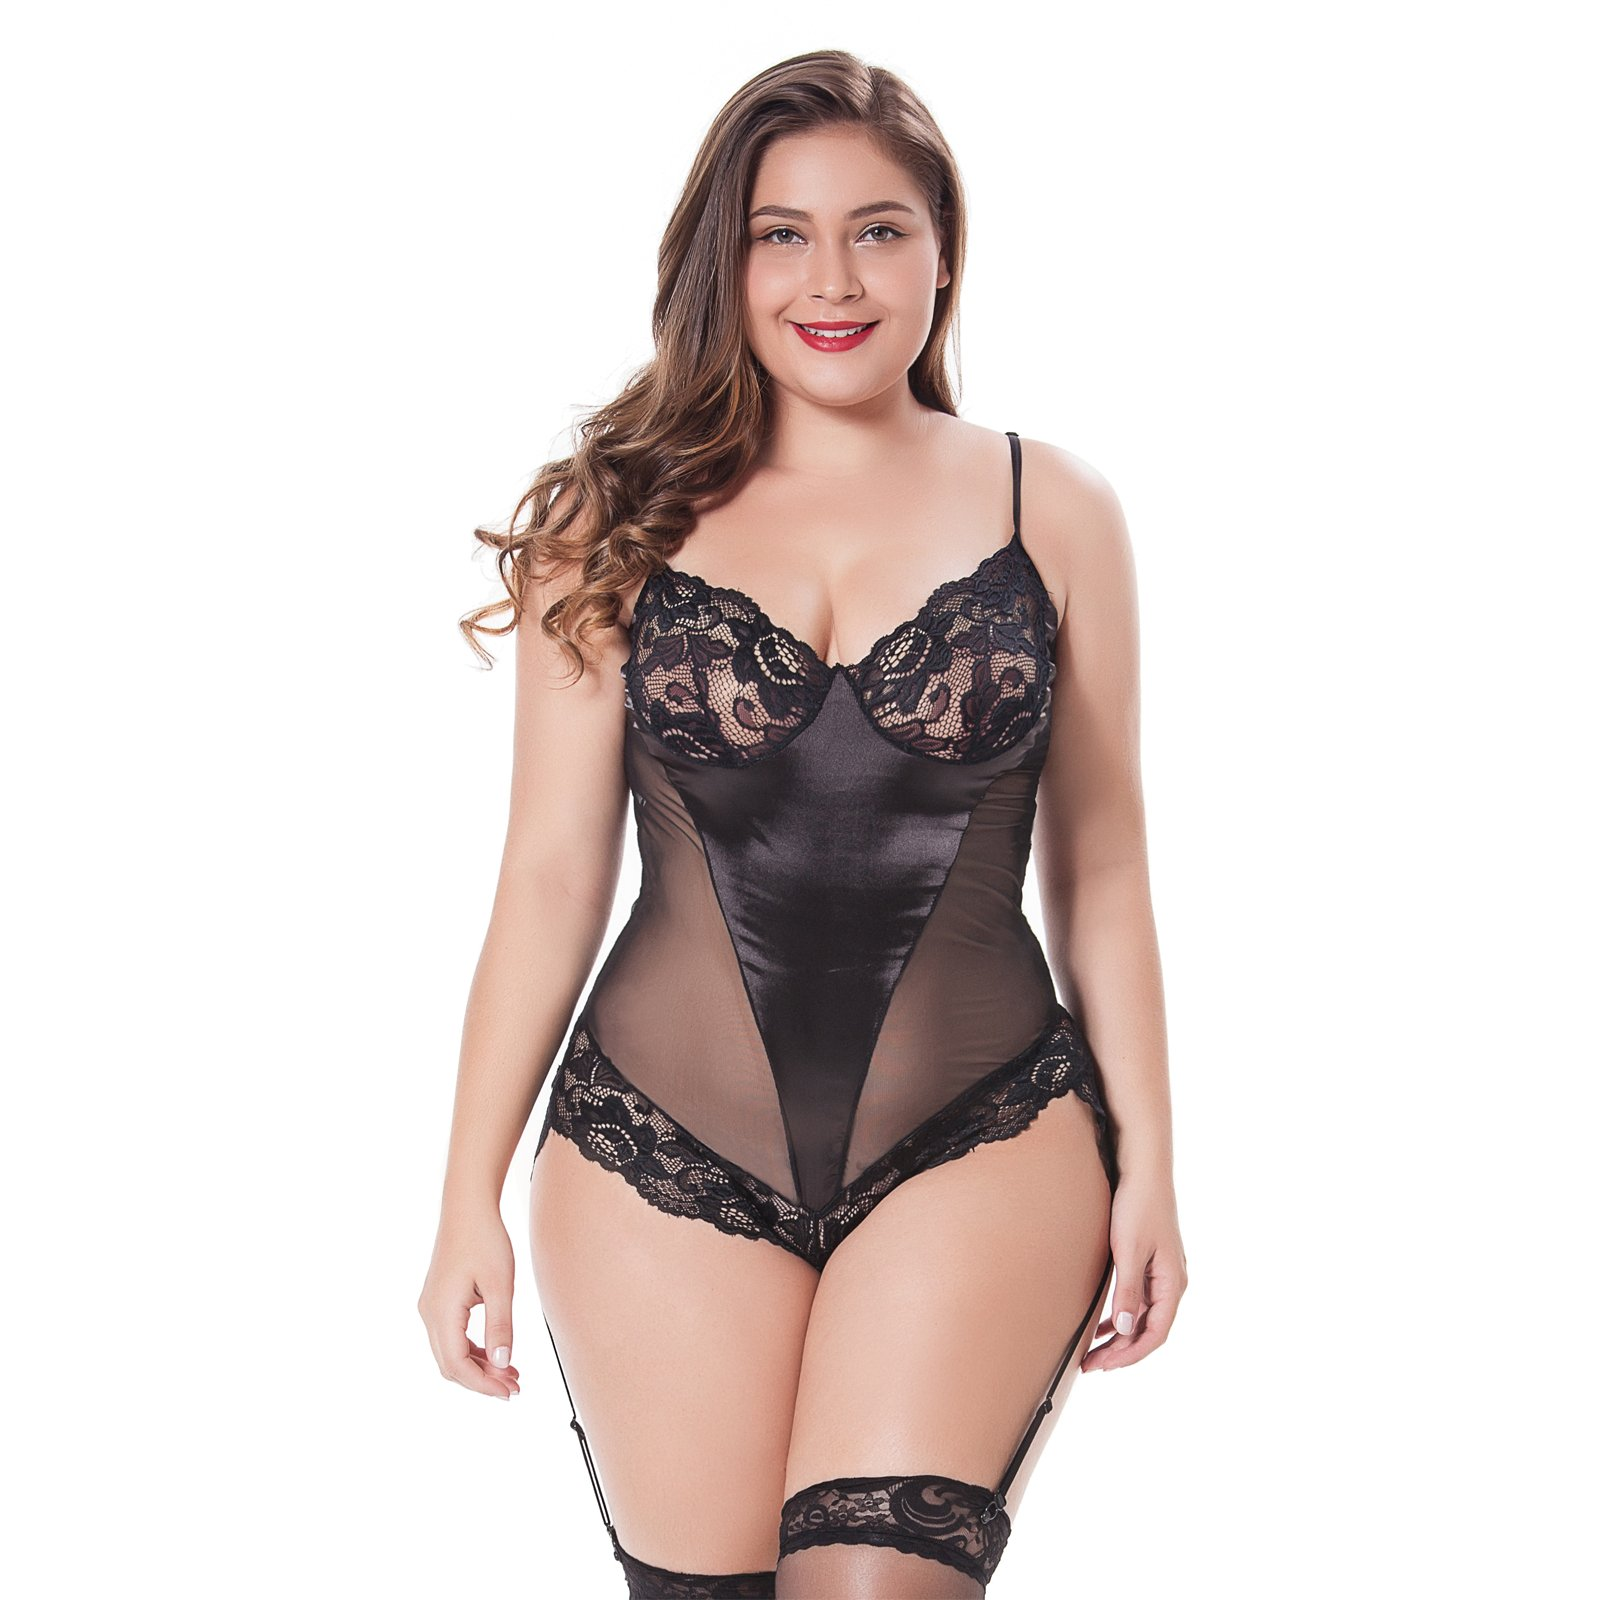 Women's Plus Size Lace Babydoll Bodysuit Teddy Chemise Lingerie One Piece Babydoll Nightwear Leotard S M L XL 2XL 3XL 4XL